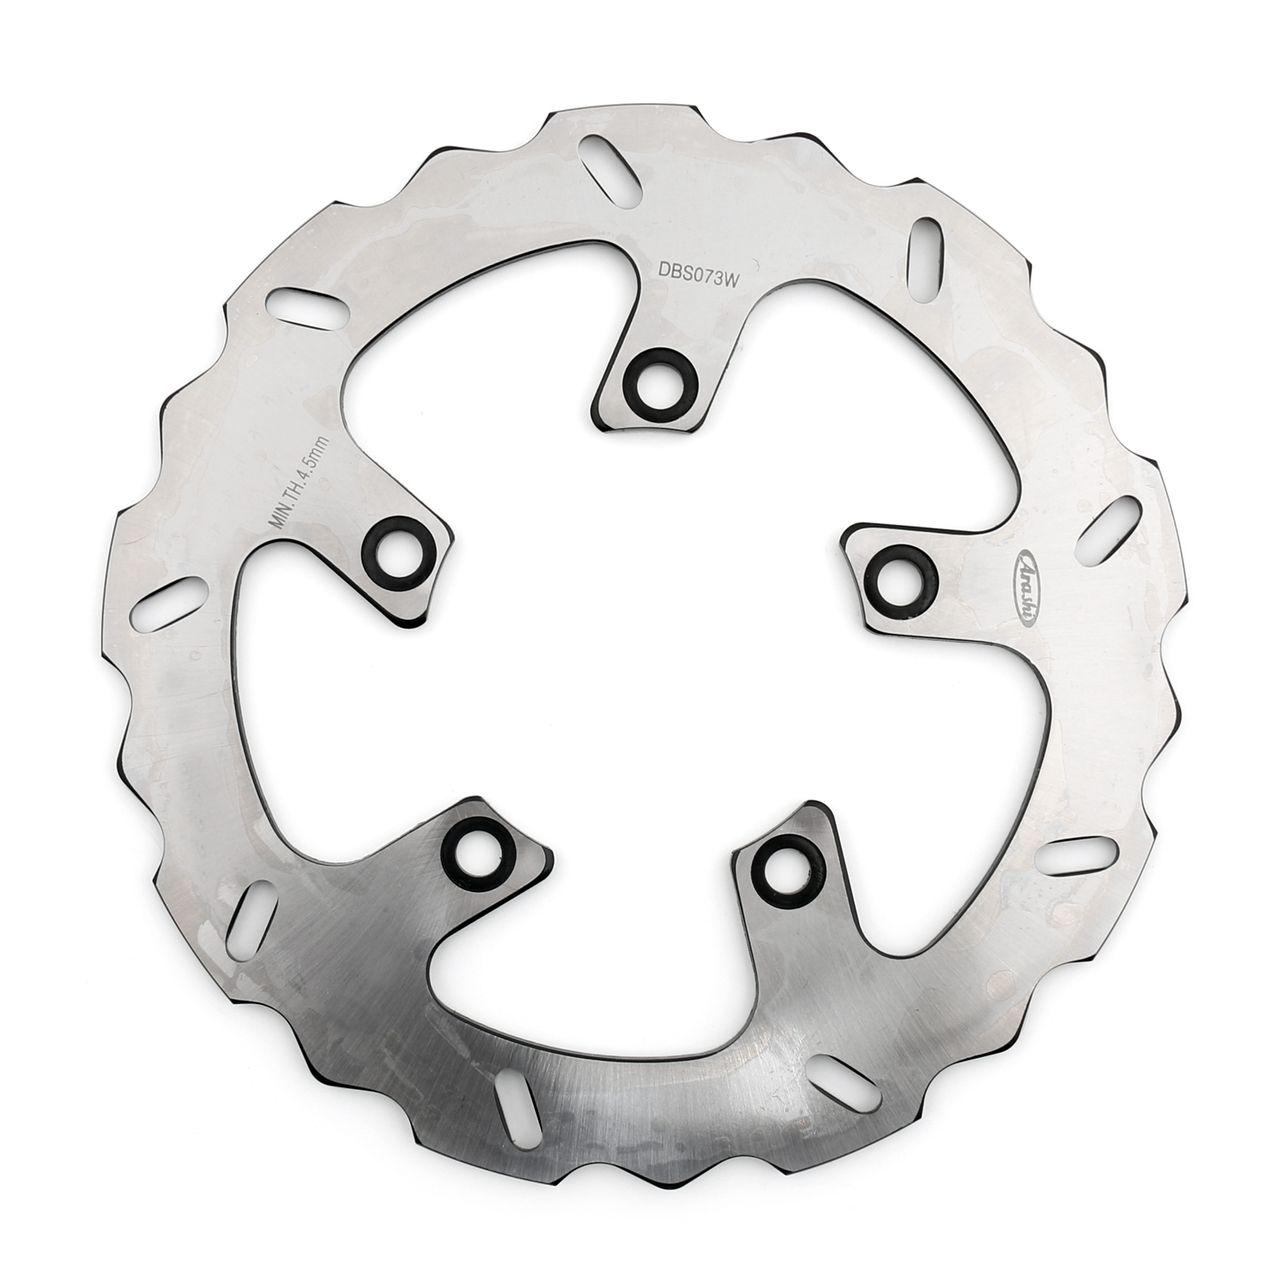 Rear Brake Disc Rotor Kawasaki ZRX 1100 99 00 R S 1200 01 06